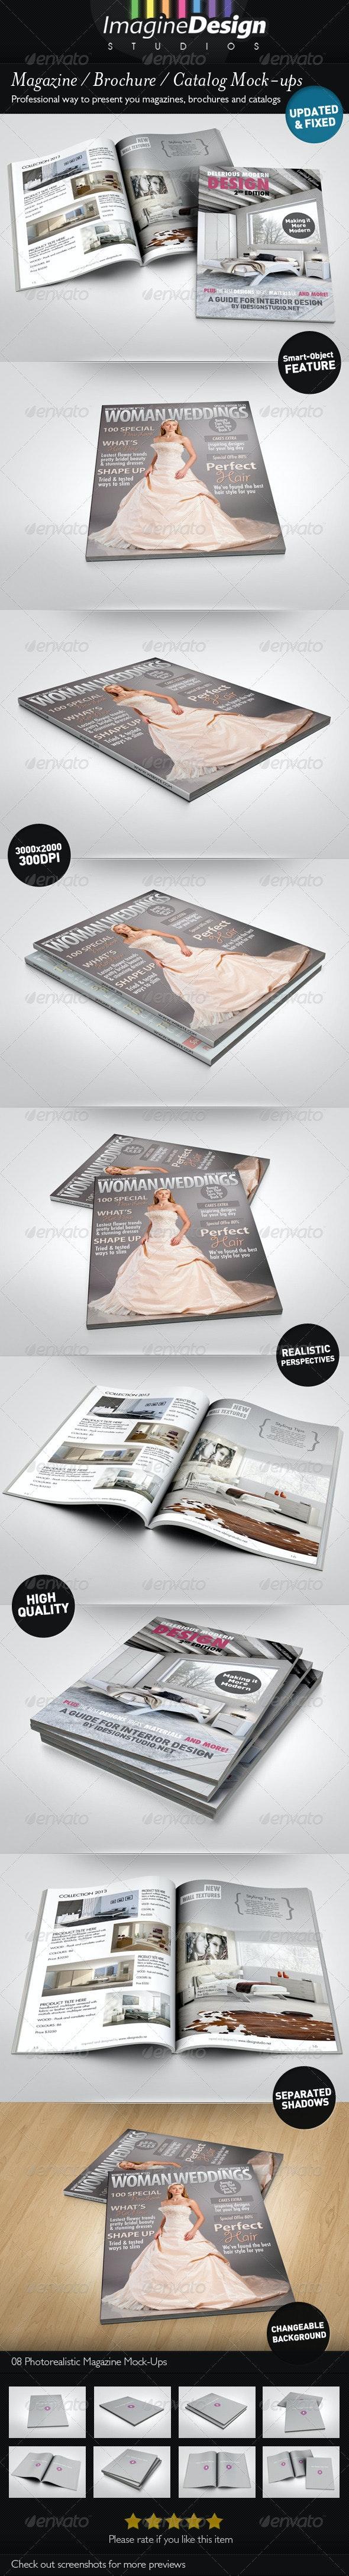 Photorealistic Brochure / Magazine Mock-up - Magazines Print